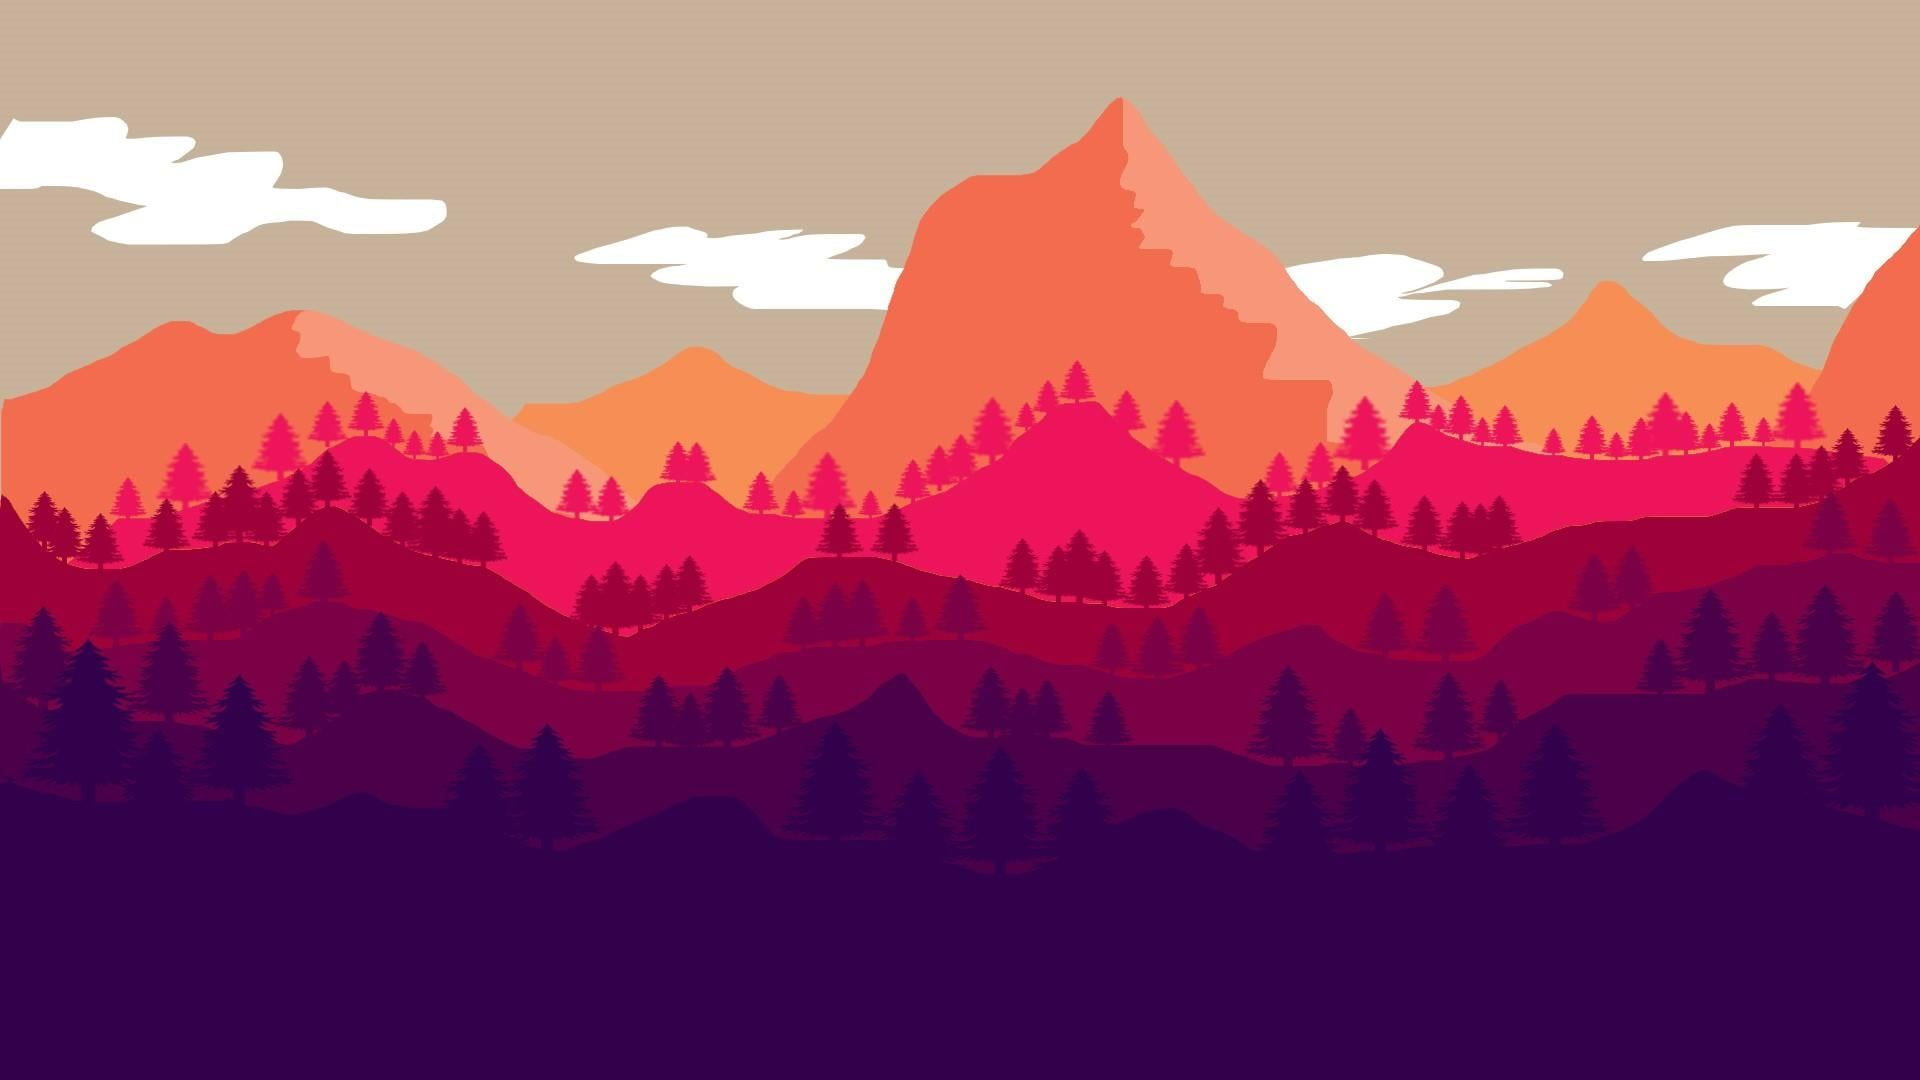 Tree Sky Cool Red Flat Design Material Design Graphics Illustration Graphic Design Design Art Artwor Graphic Wallpaper Art Wallpaper Android Wallpaper